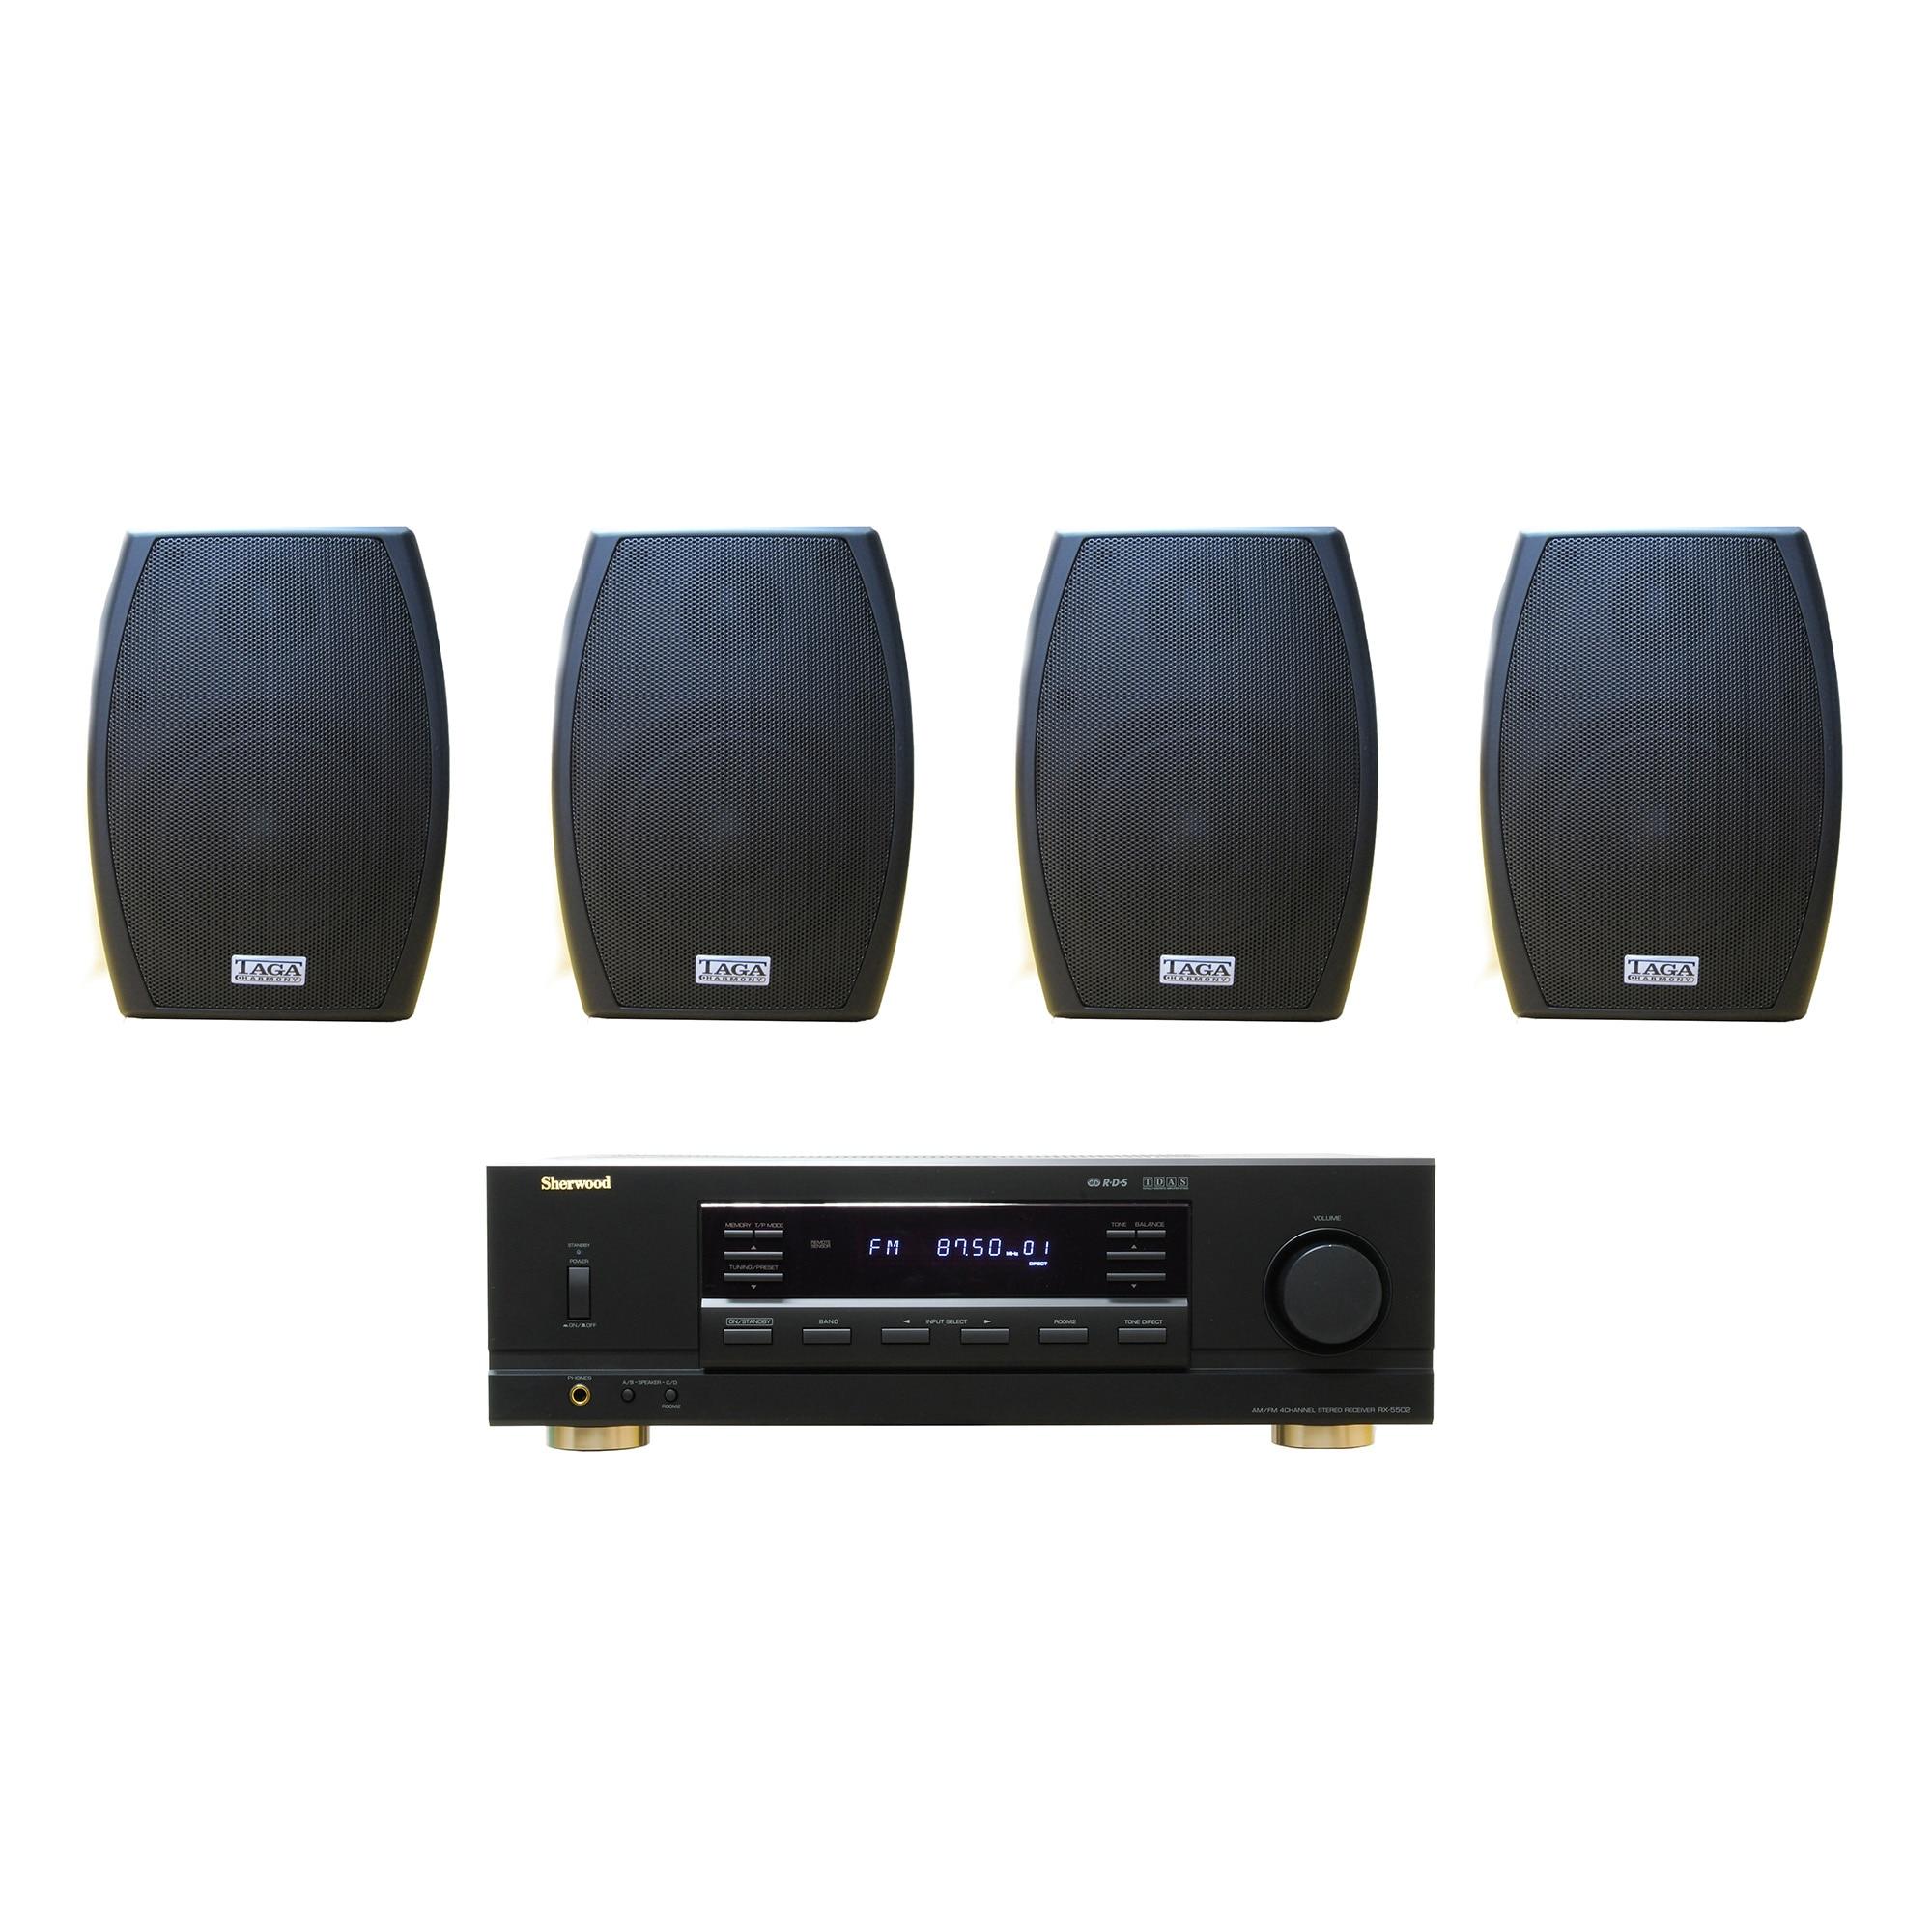 Fotografie Sistem sonorizare Sherwood RX-5502 + boxe Taga Harmony TOS-315 (2perechi), Negru